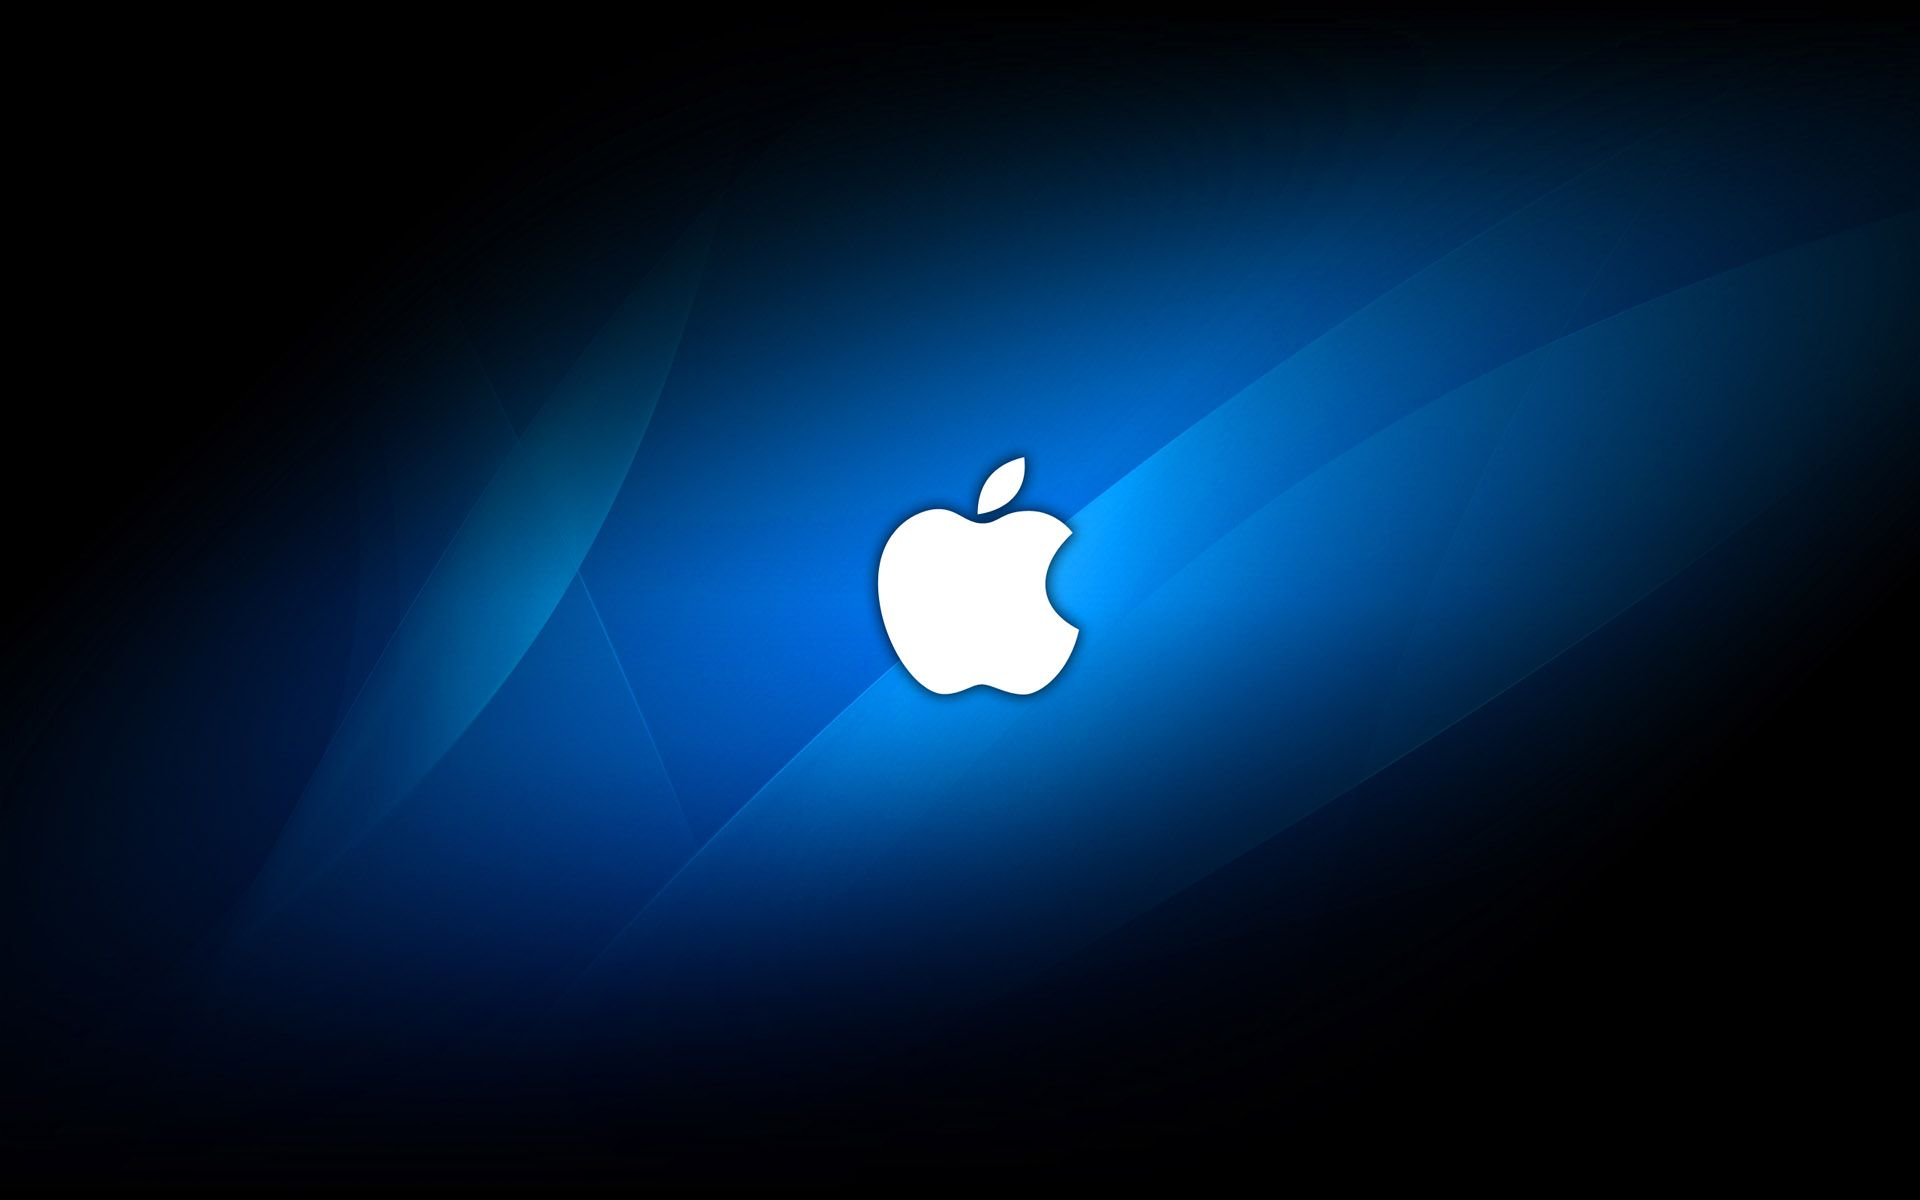 Papel De Parede Apple Azul Wallpaper Para Download No